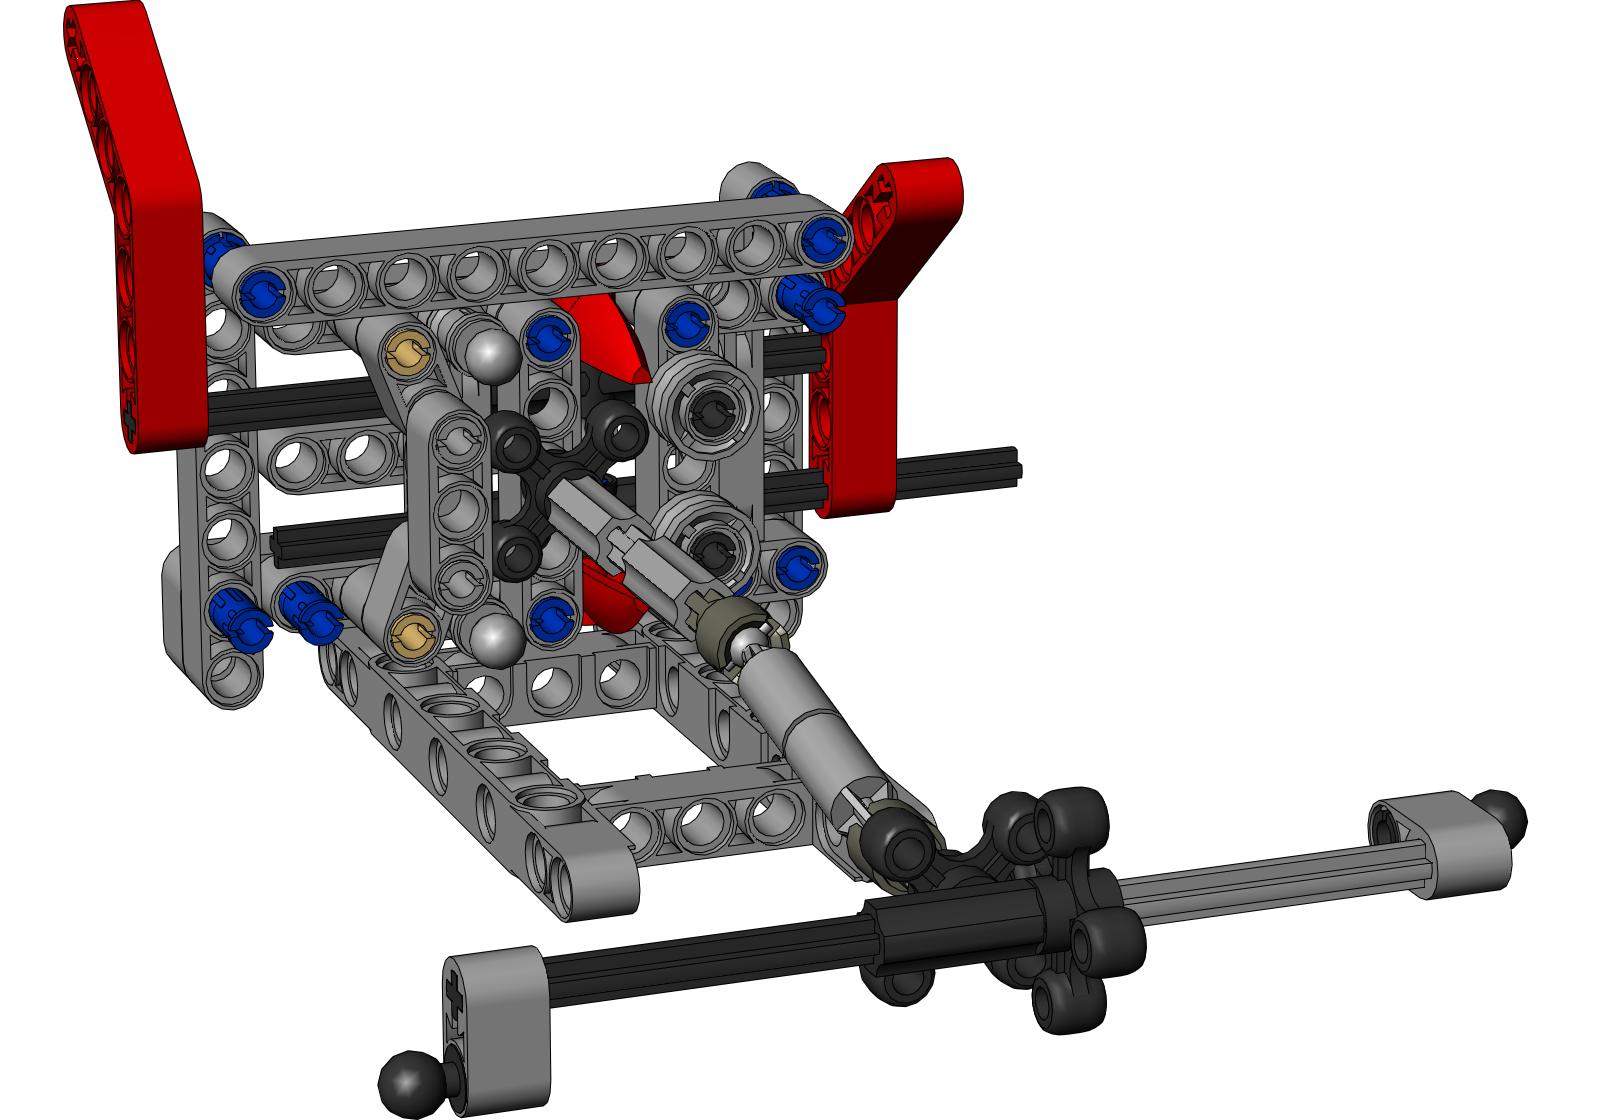 wip koenigsegg one 1 lego technic mindstorms model. Black Bedroom Furniture Sets. Home Design Ideas